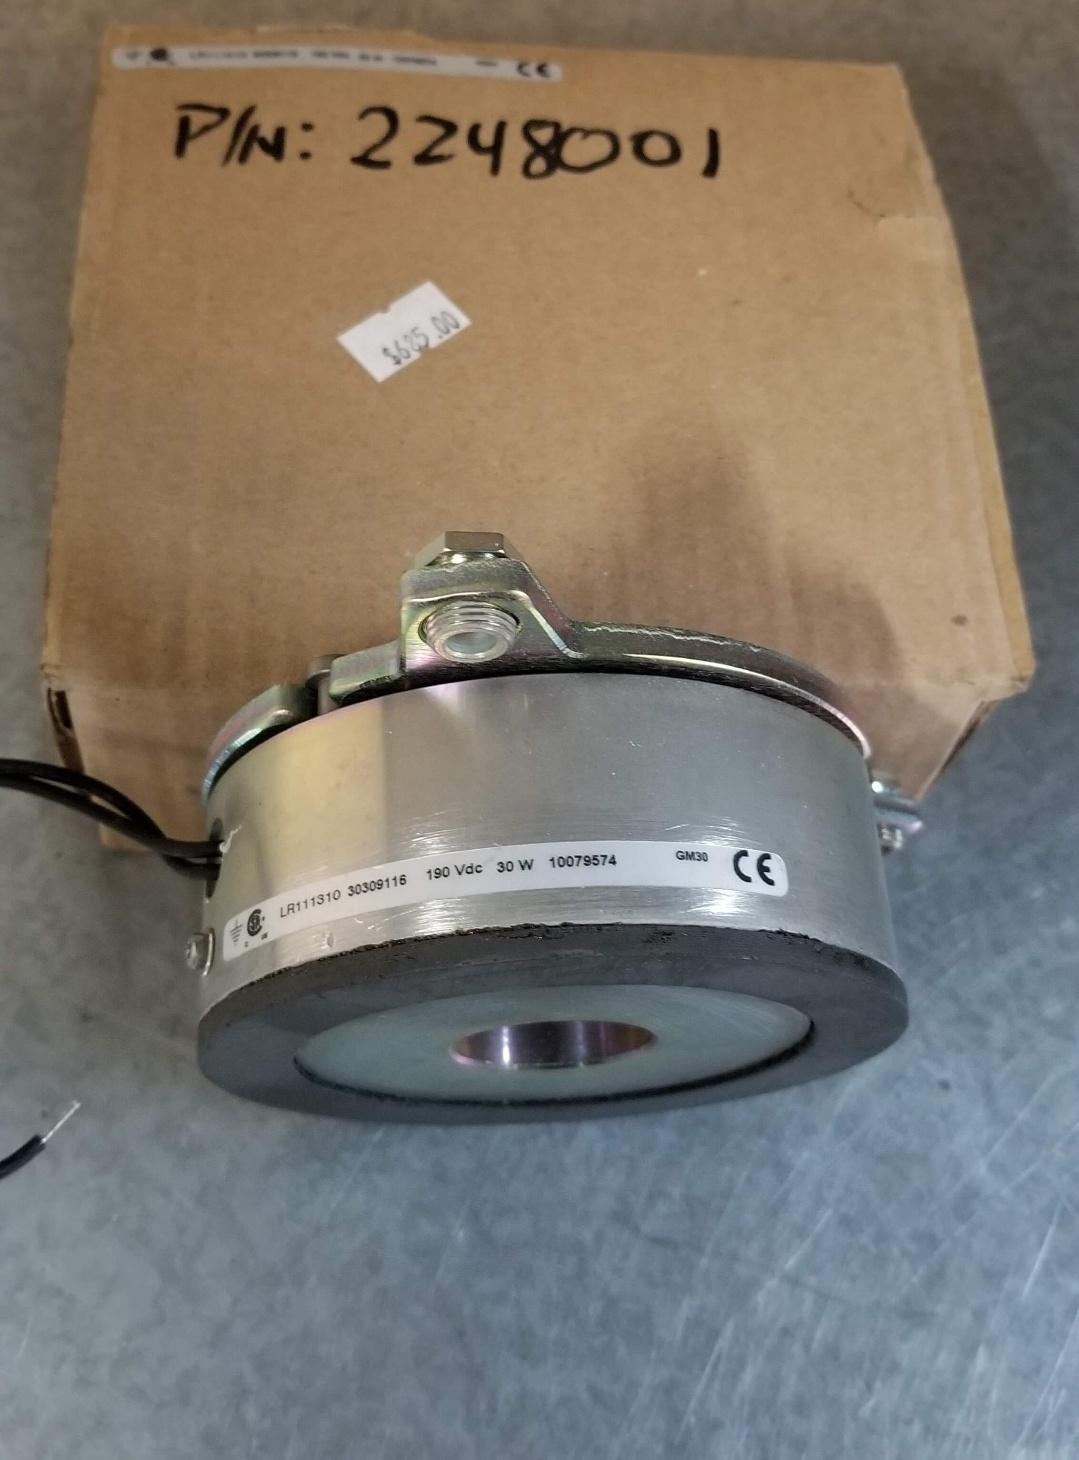 Kone Brake Assembly 190Vdc P/N: 2248001 $685.00